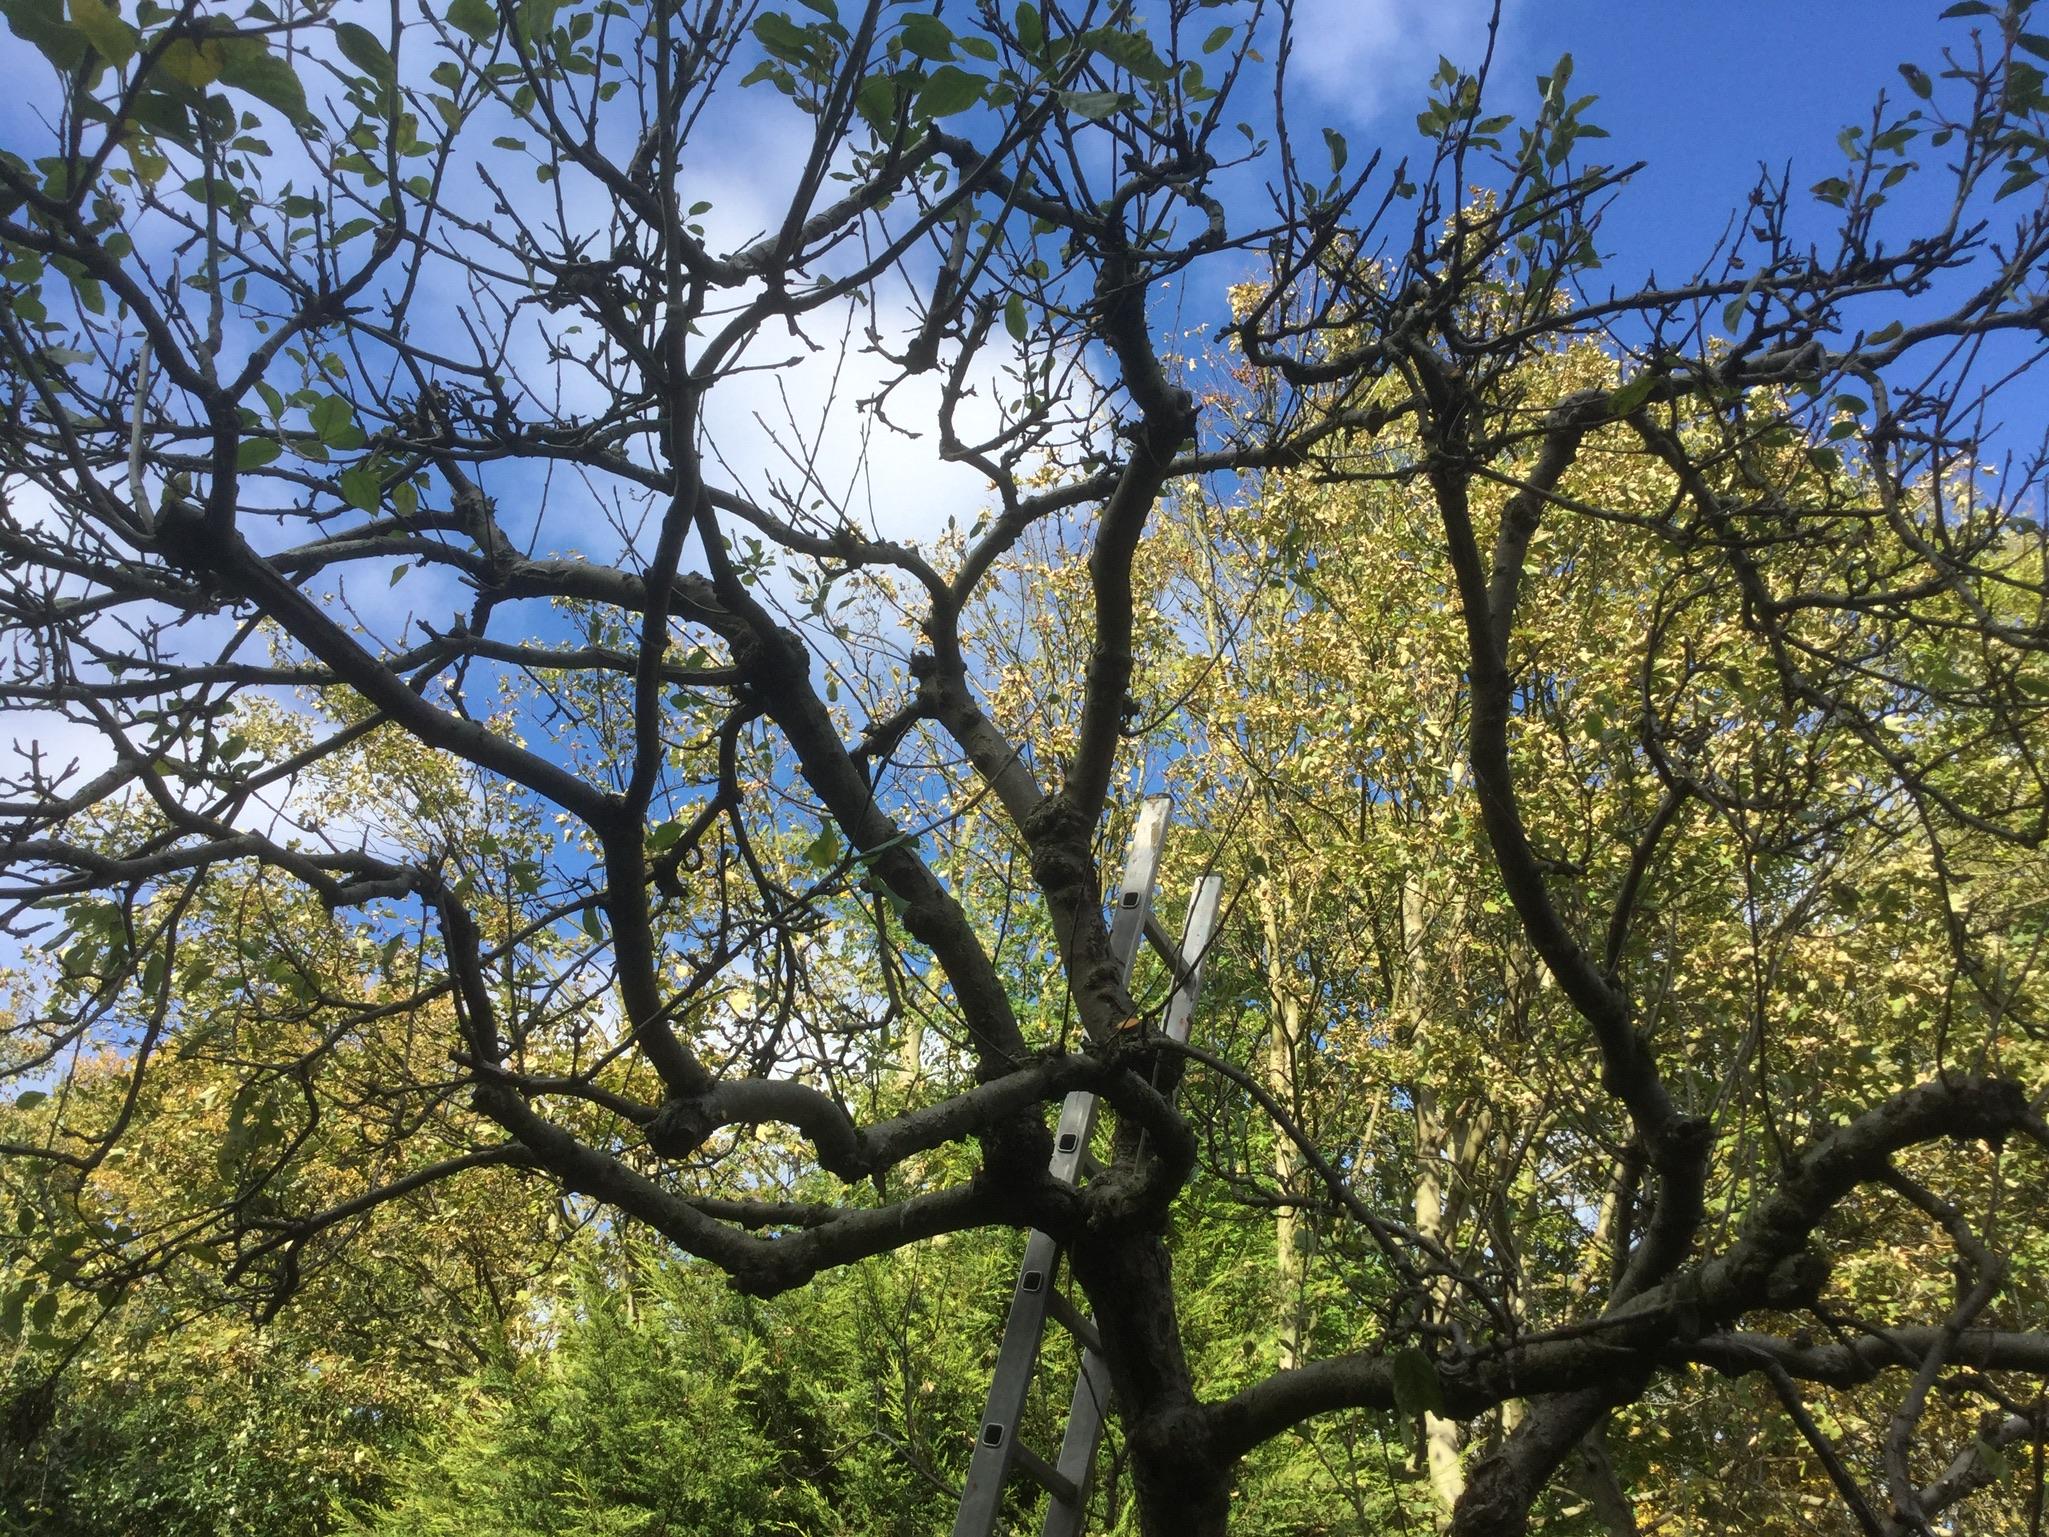 London cottage garden pruning our old apple tree for Trees garden of jane delawney blogspot